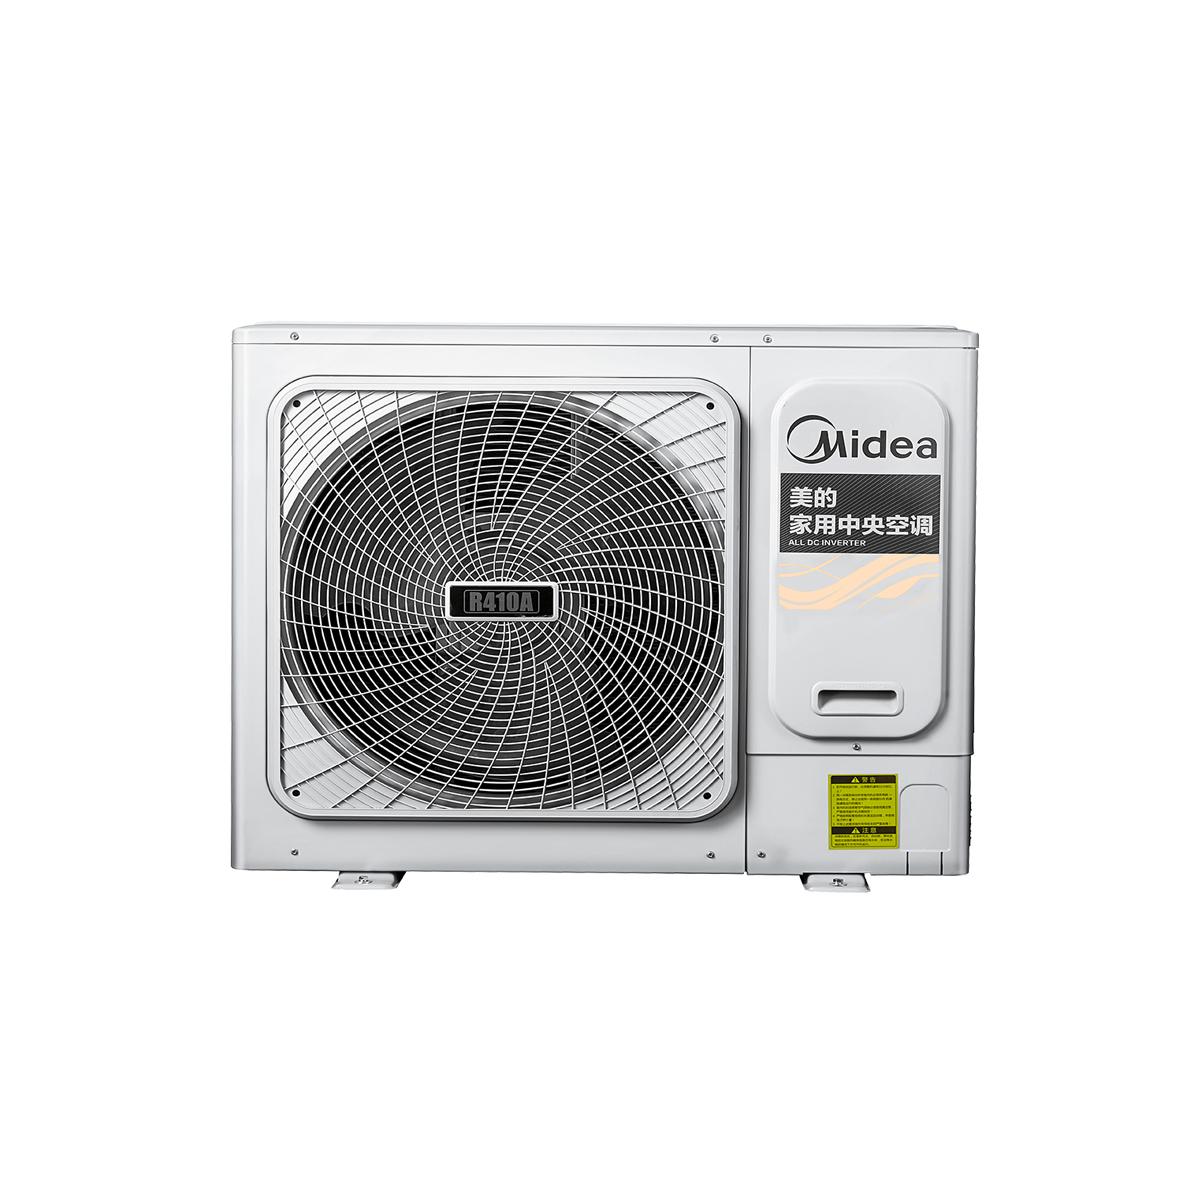 Midea/美的 MDVH-V140W/N1-5R0(E1)中央空调外机 说明书.pdf